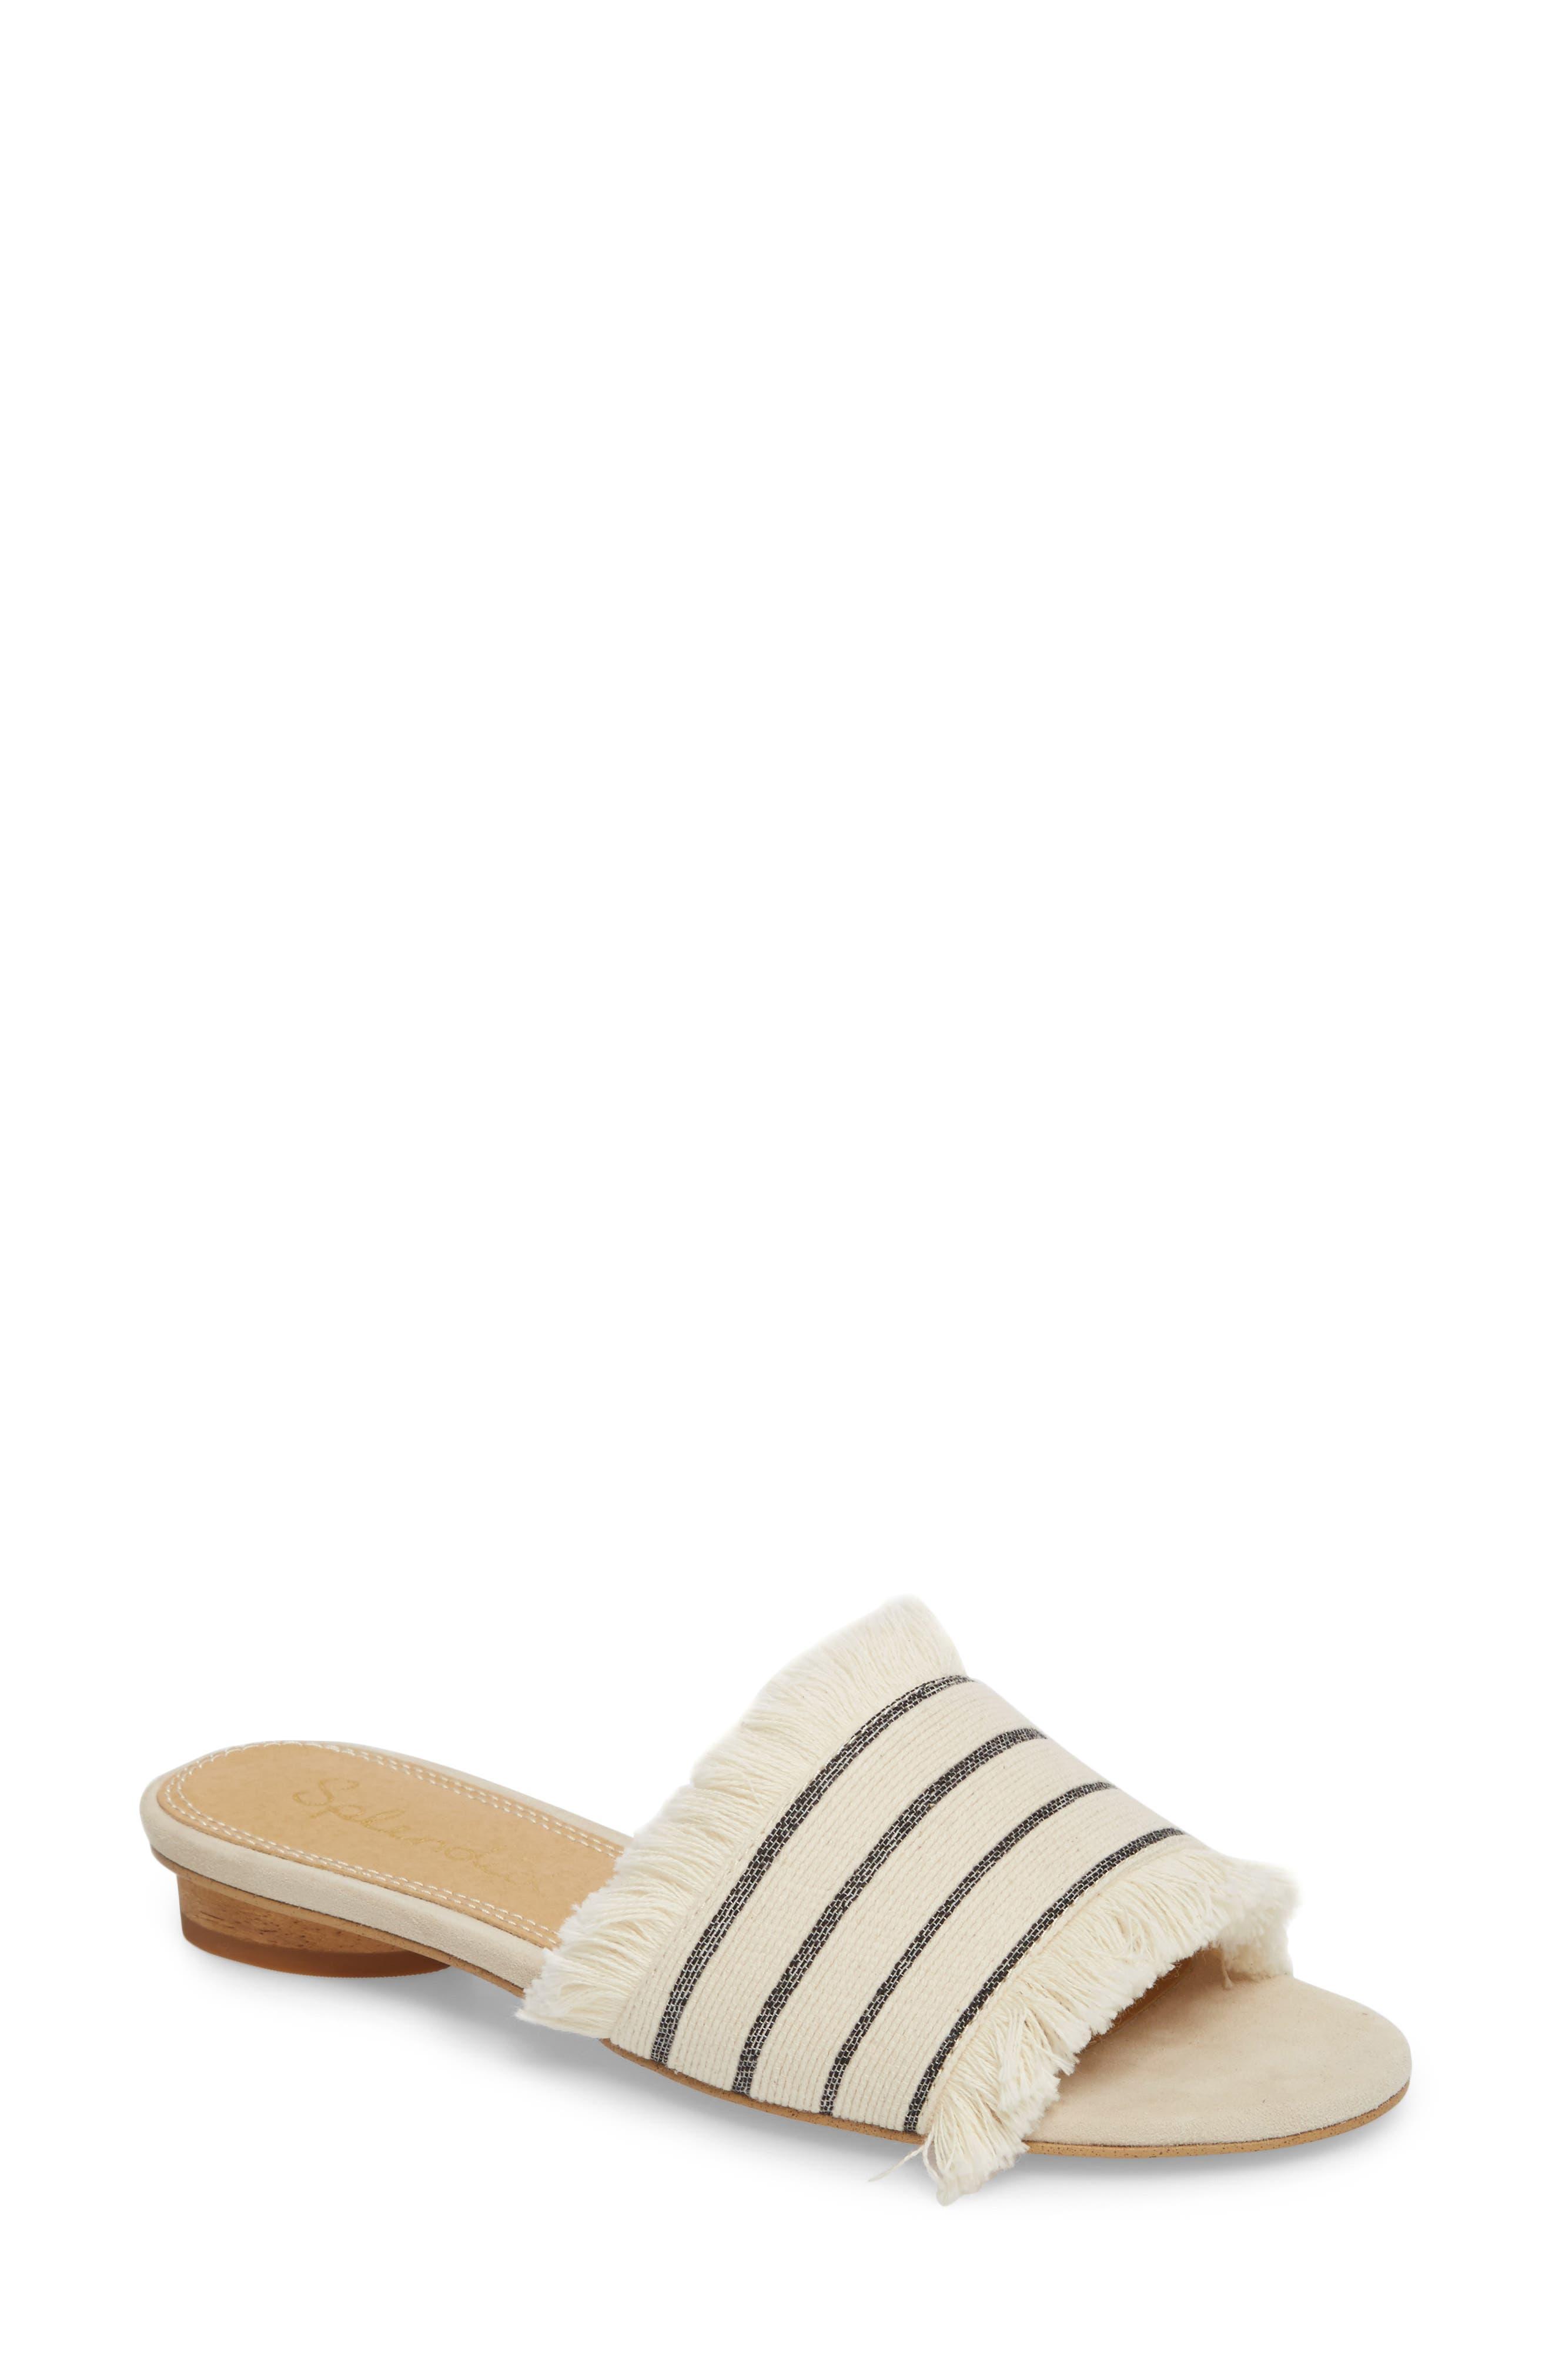 Baldwyn Fringe Slide Sandal,                             Main thumbnail 1, color,                             Cream Leather